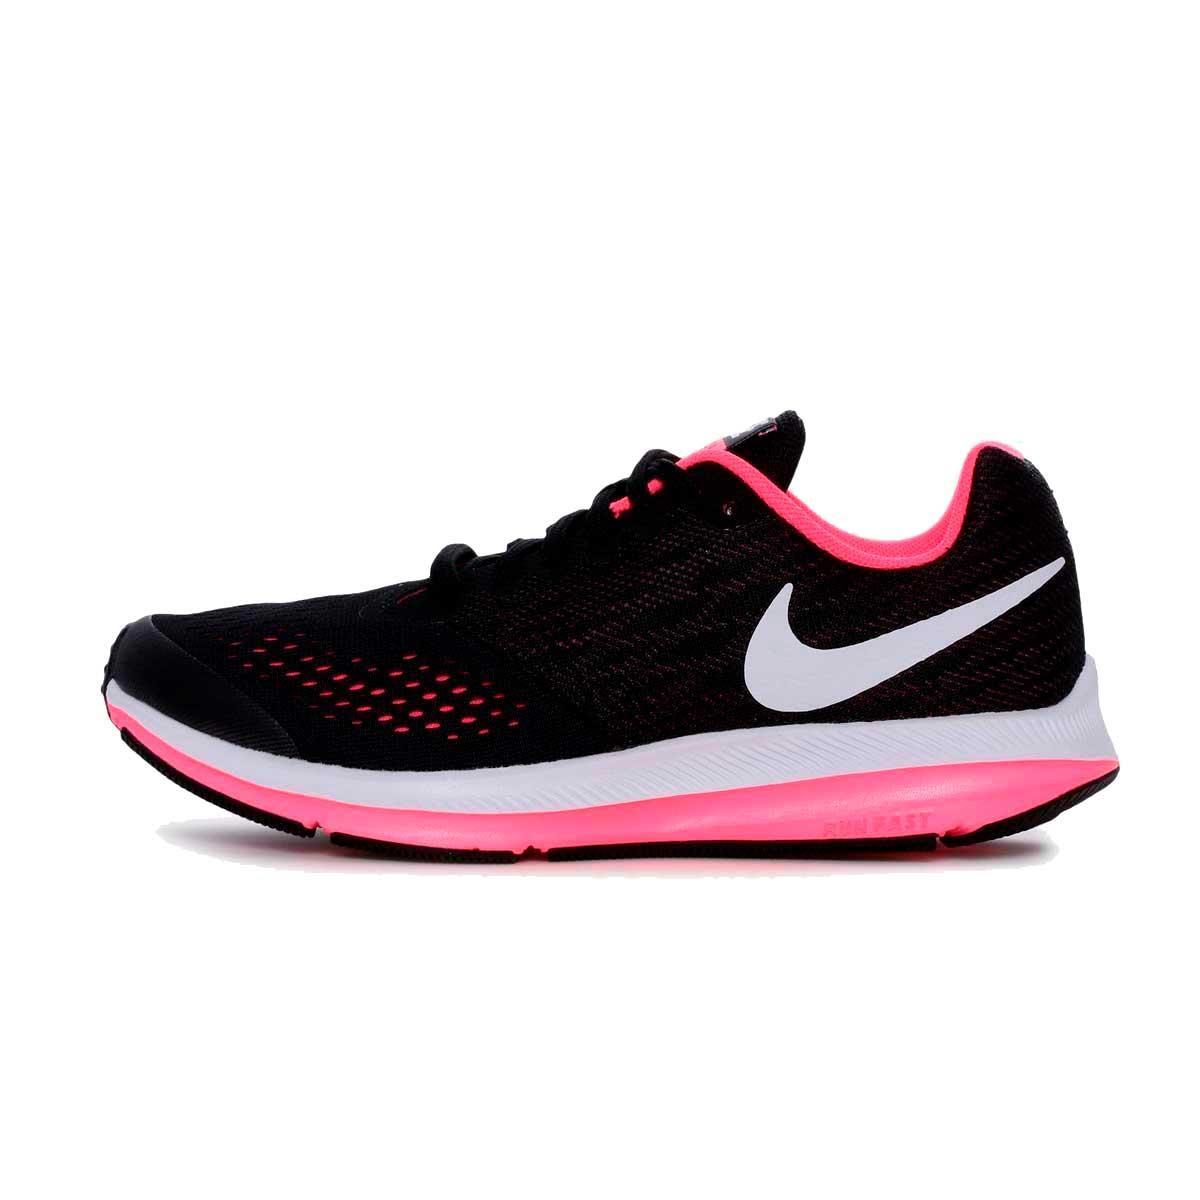 24f6445df95 Tênis Nike Zoom Winflo 4 Juvenil